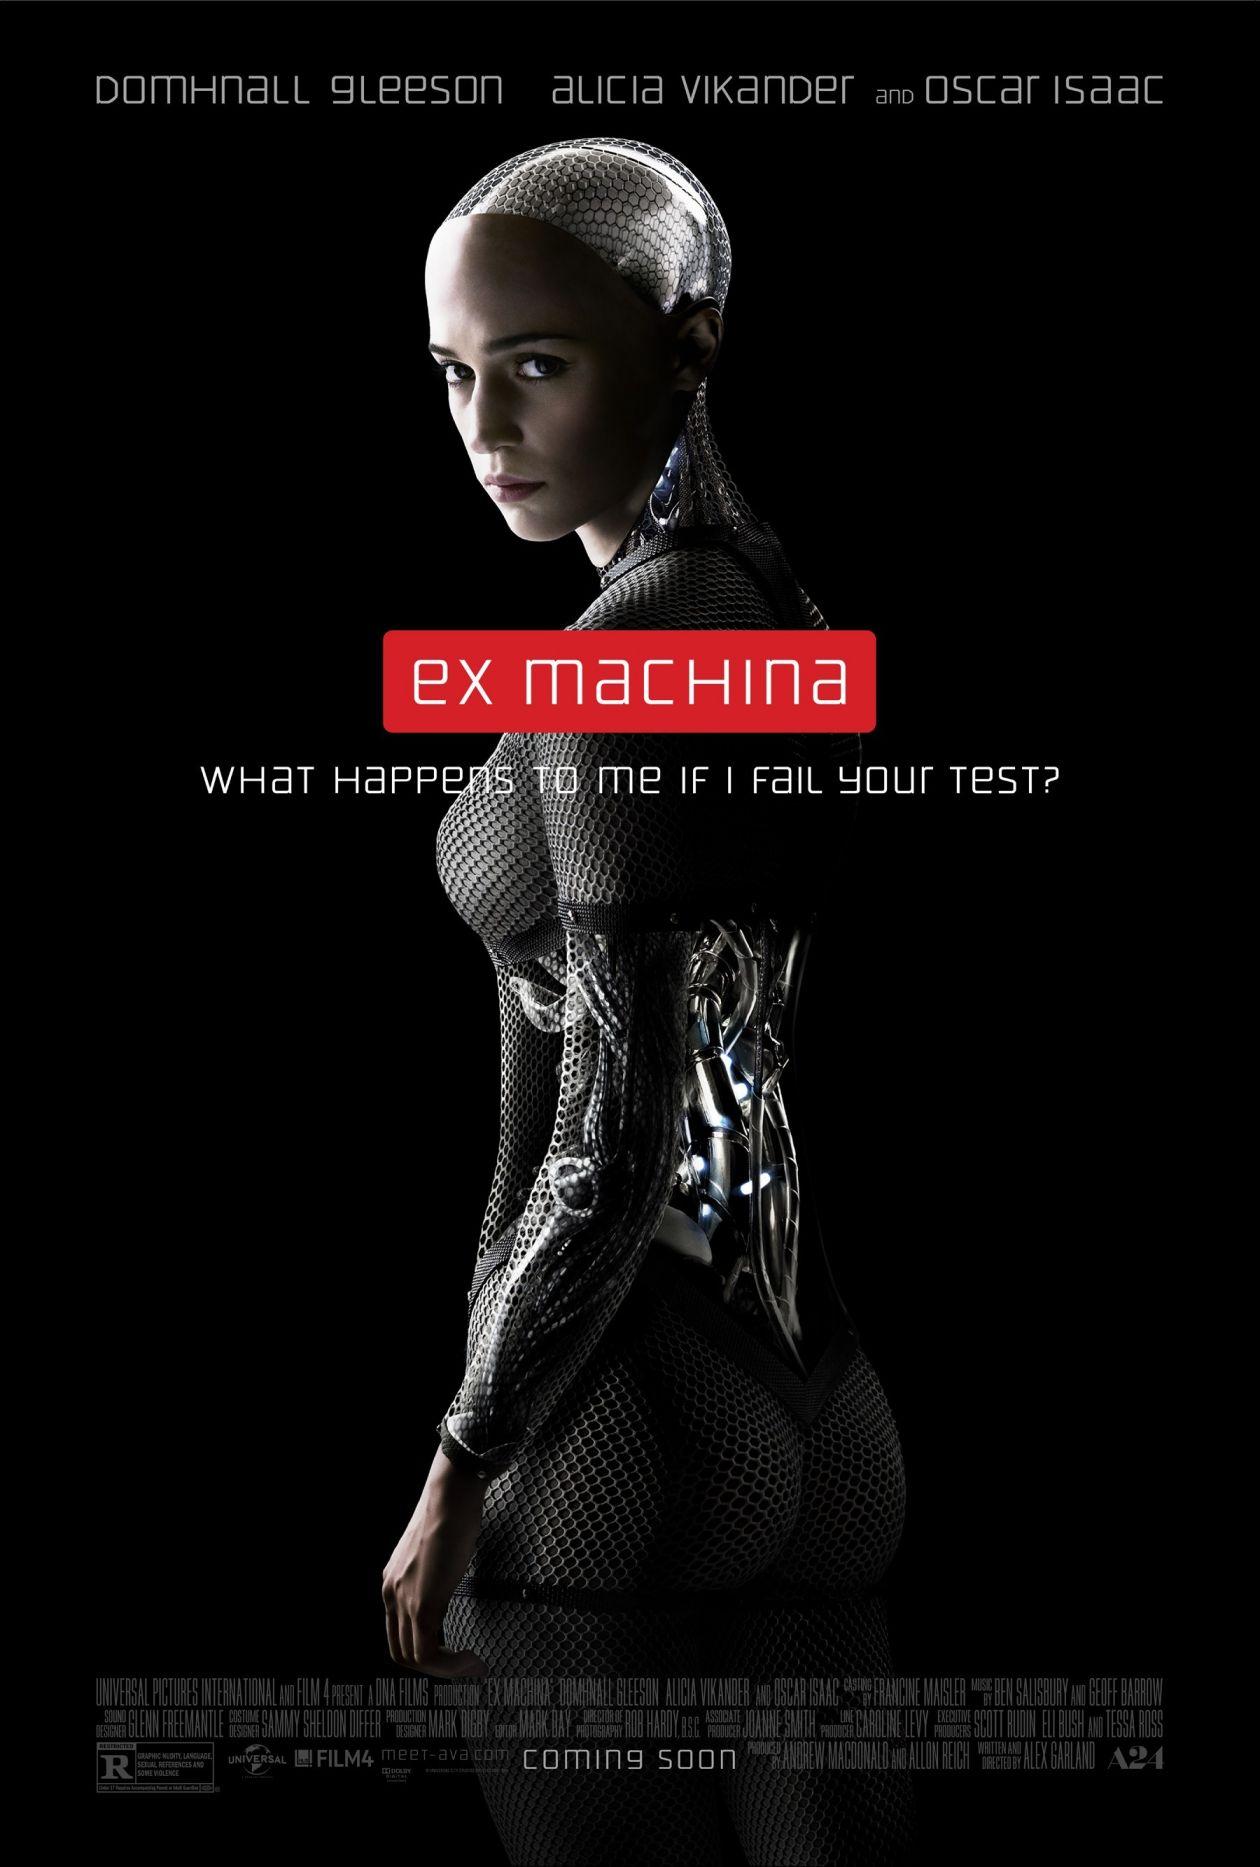 Alicia Vikander | Ex Machina / Alex Garland / Movie Poster / Affiche film